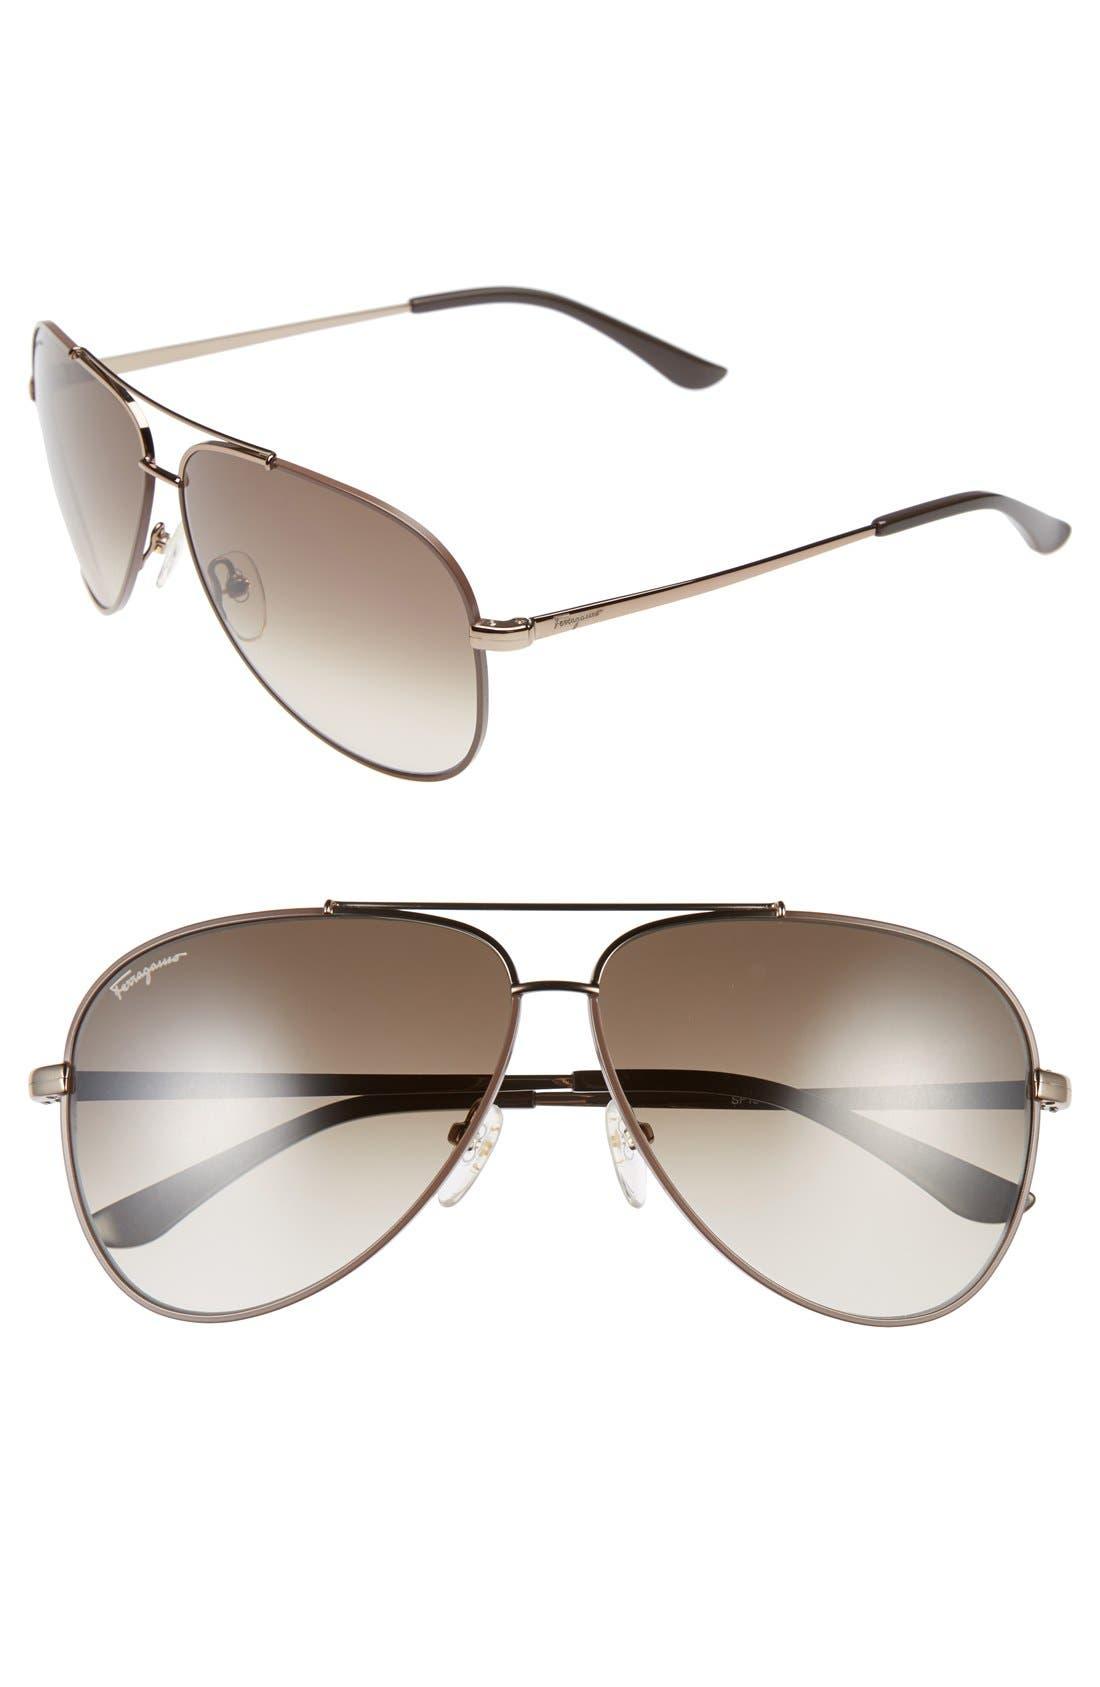 60mm Aviator Sunglasses,                             Main thumbnail 1, color,                             211